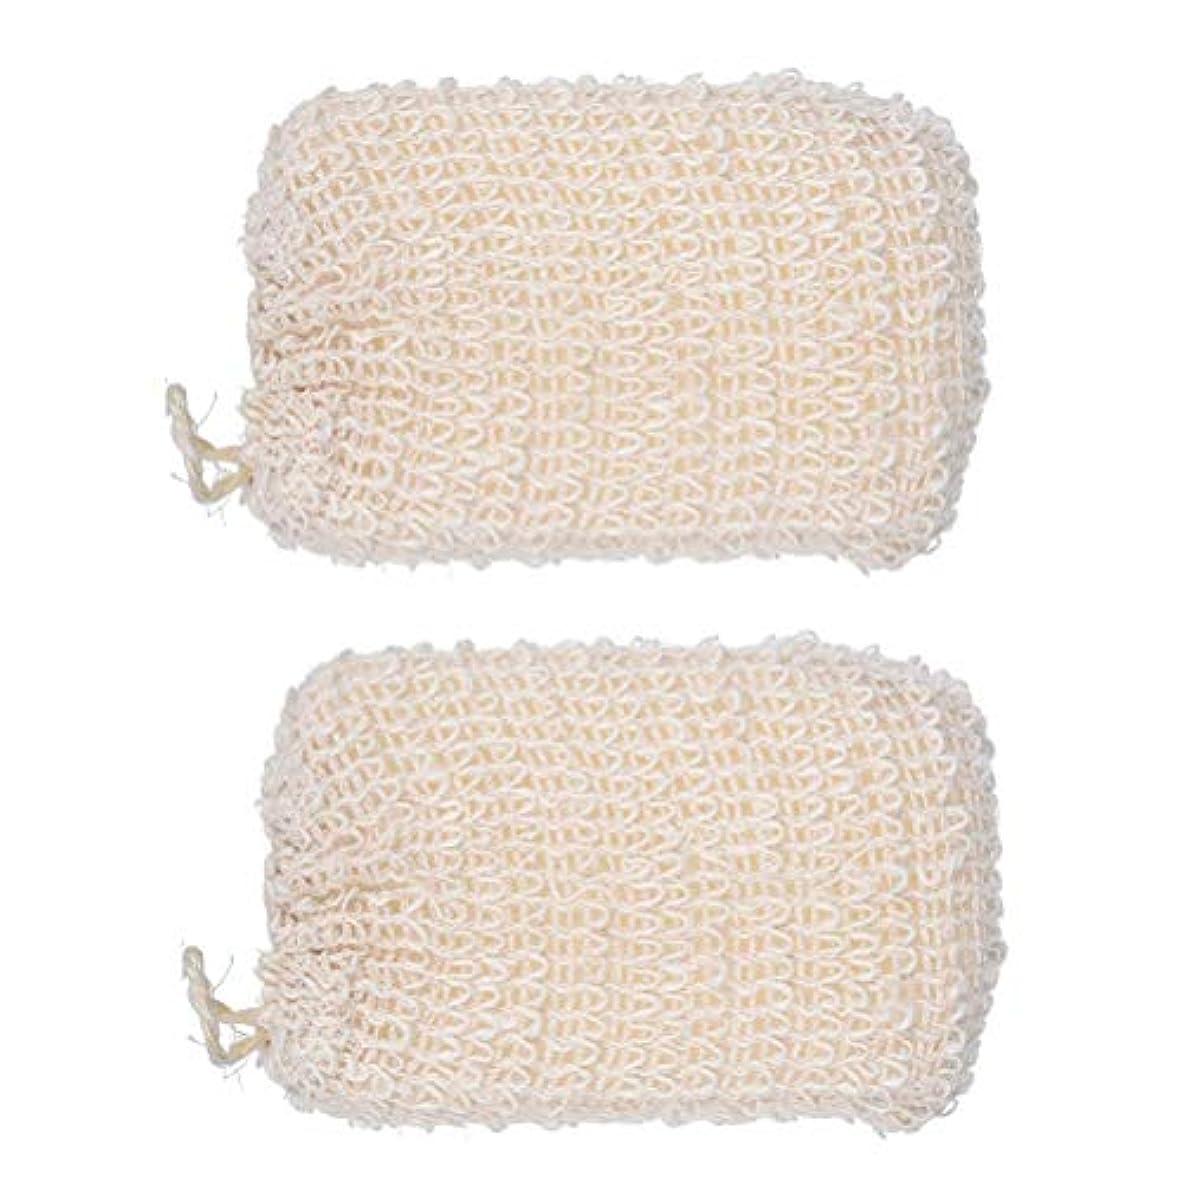 Beaupretty 2ピース風呂スポンジ植物綿とリネン風呂ブラシ柔らかい風呂スポンジスクラバー用女性赤ちゃん子供(ベージュ)